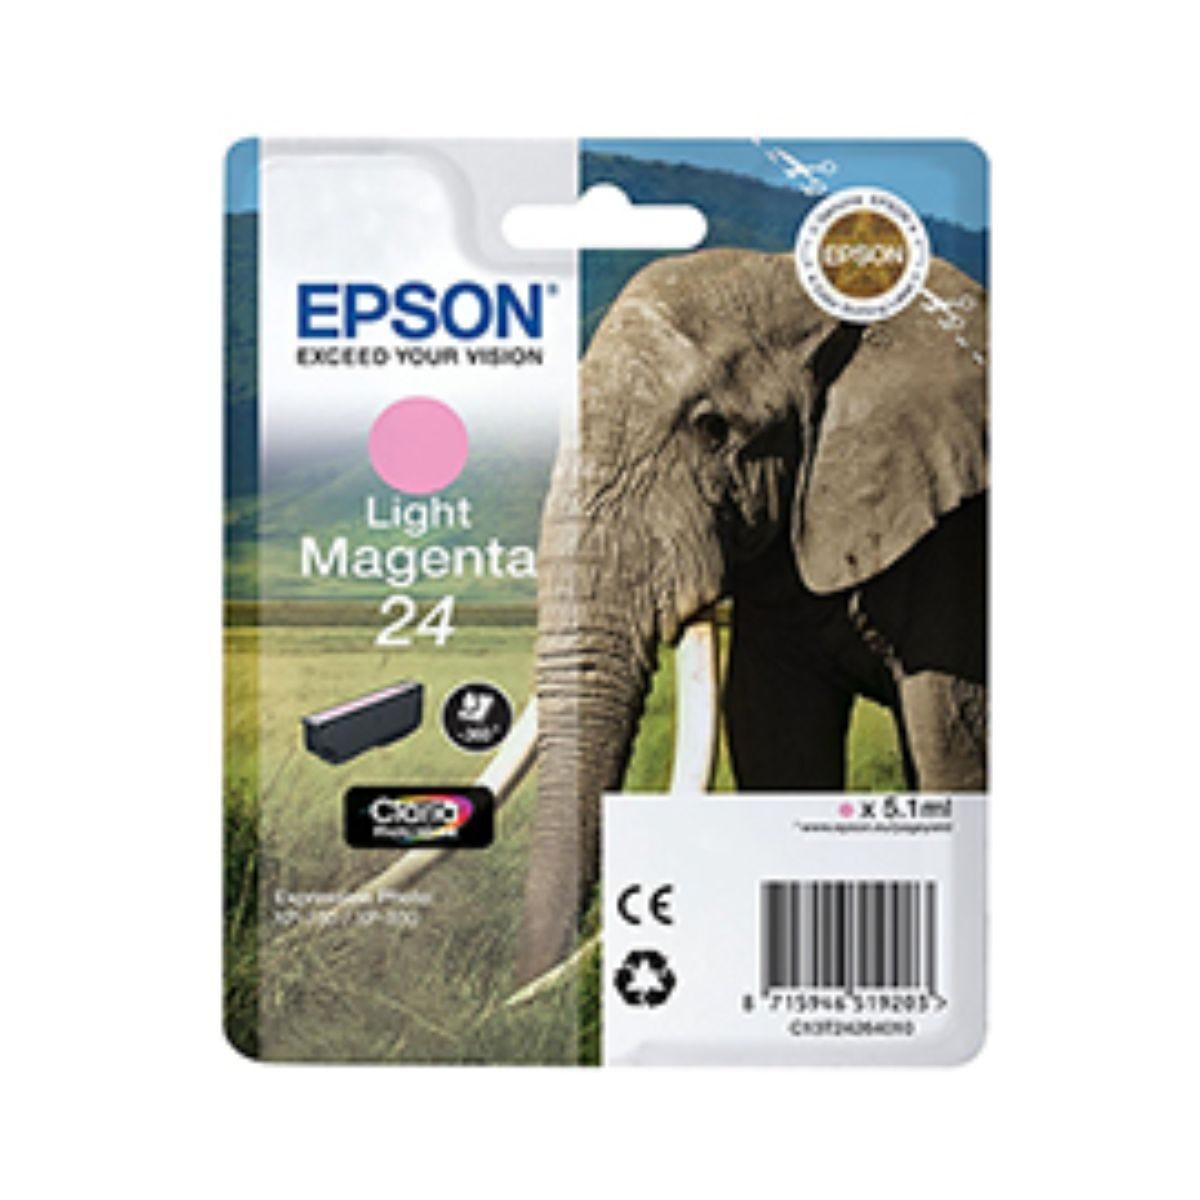 Epson T2425 24 Ink Cartridge Light Magenta